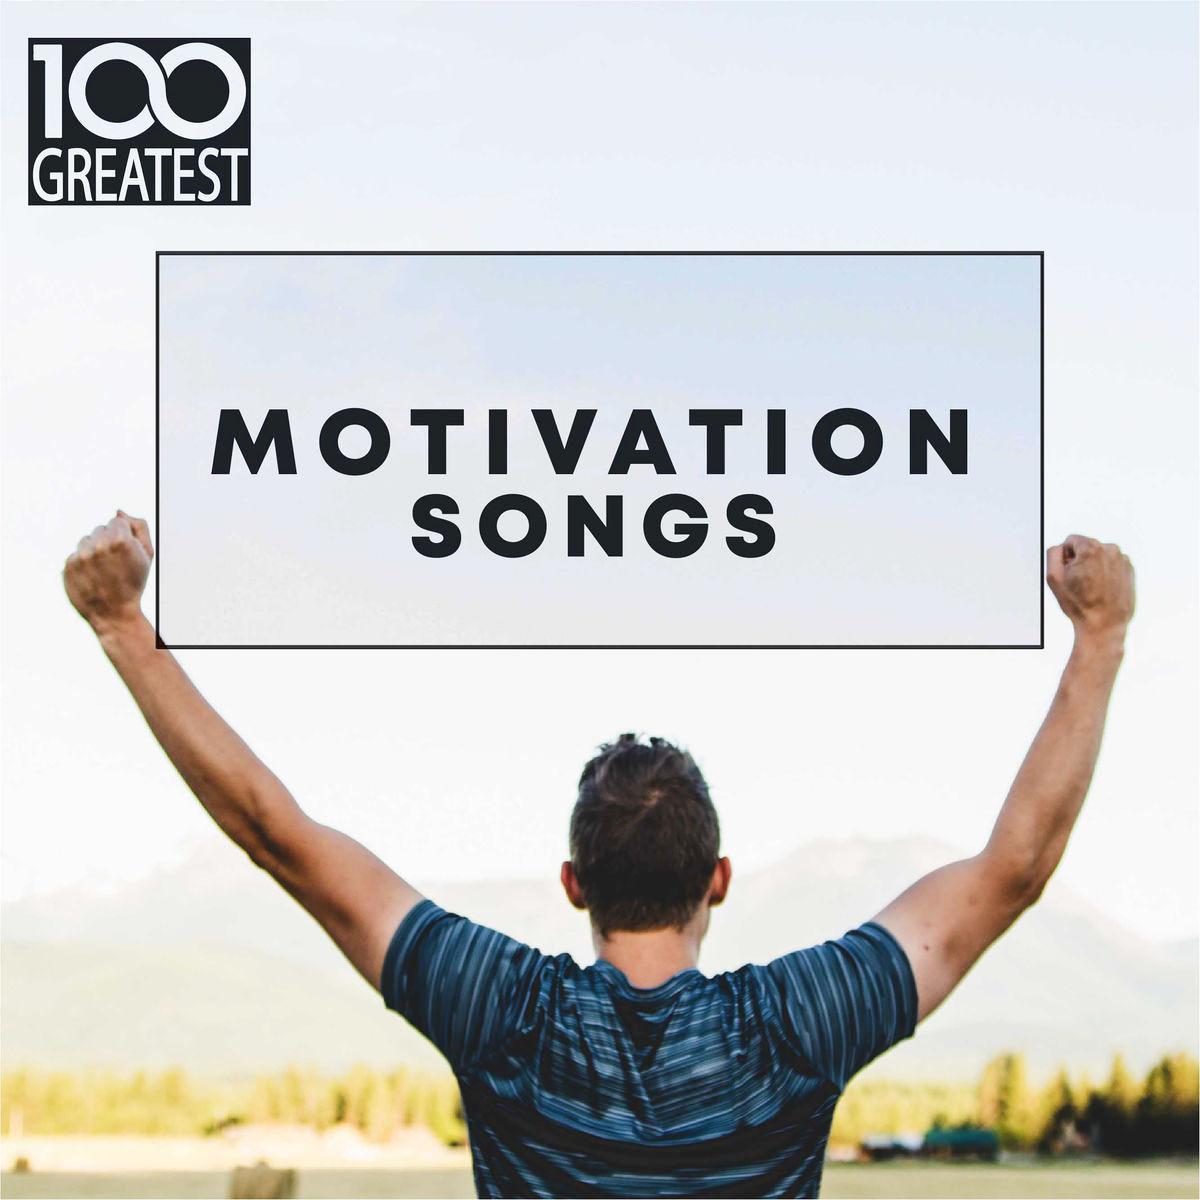 Download VA - 100 Greatest Sad Songs (2019) mp3 320 Kbps